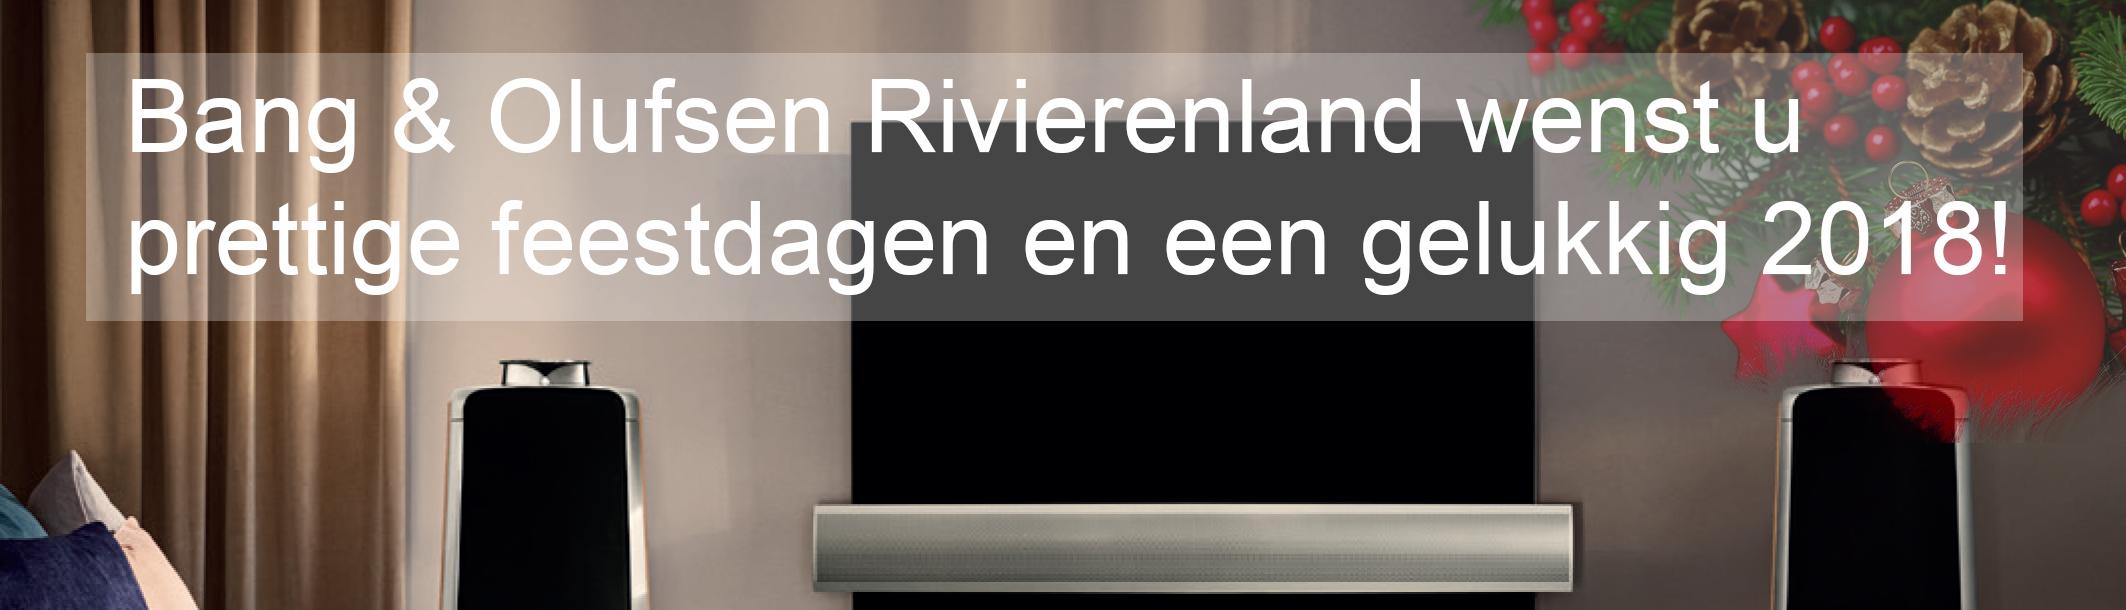 Bang & Olufsen Rivierenland Kerst